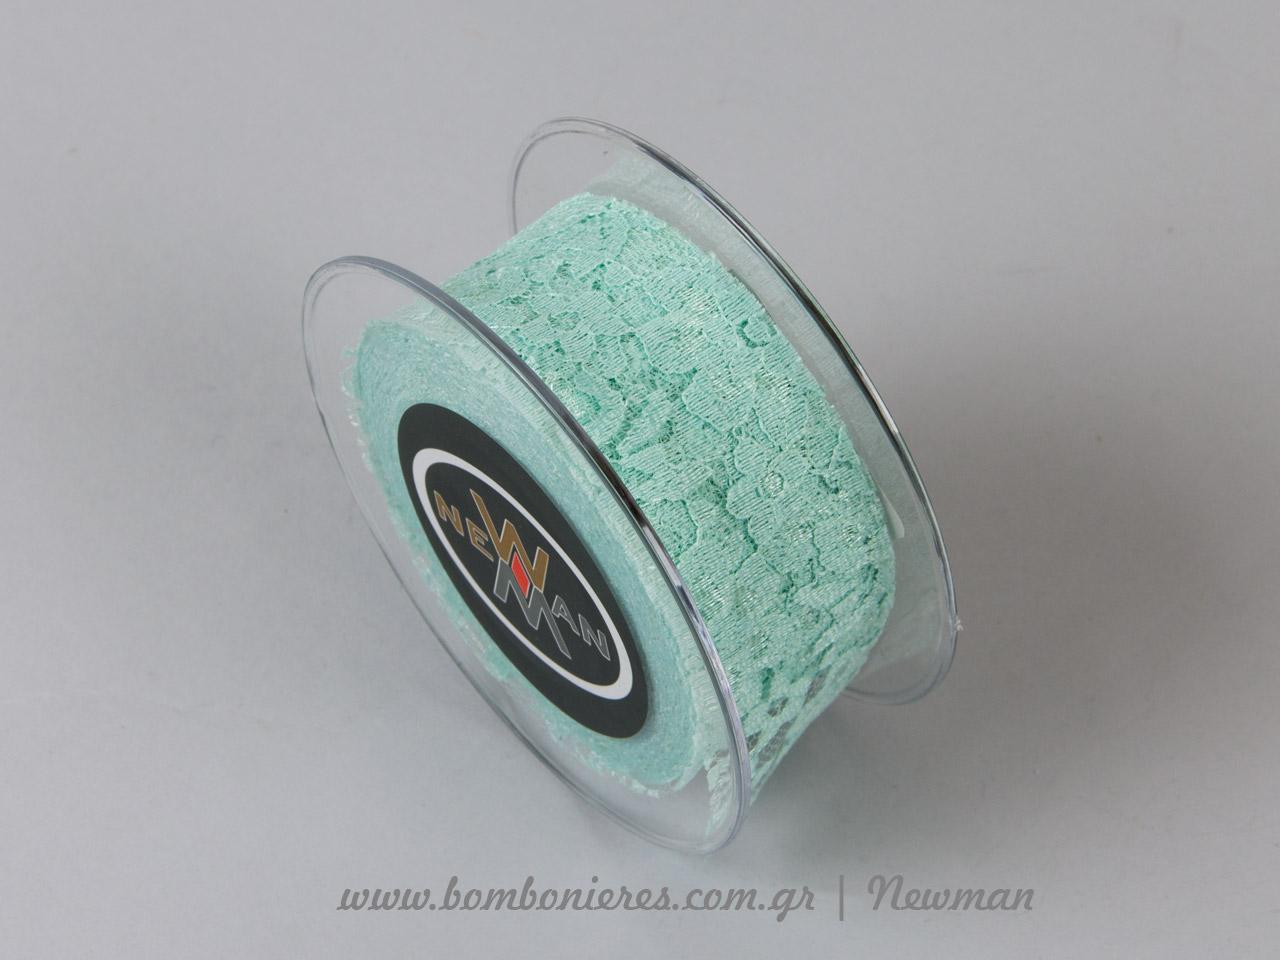 venezzia dantela 45mm 092064 δαντέλα βεραμάν χρώμα